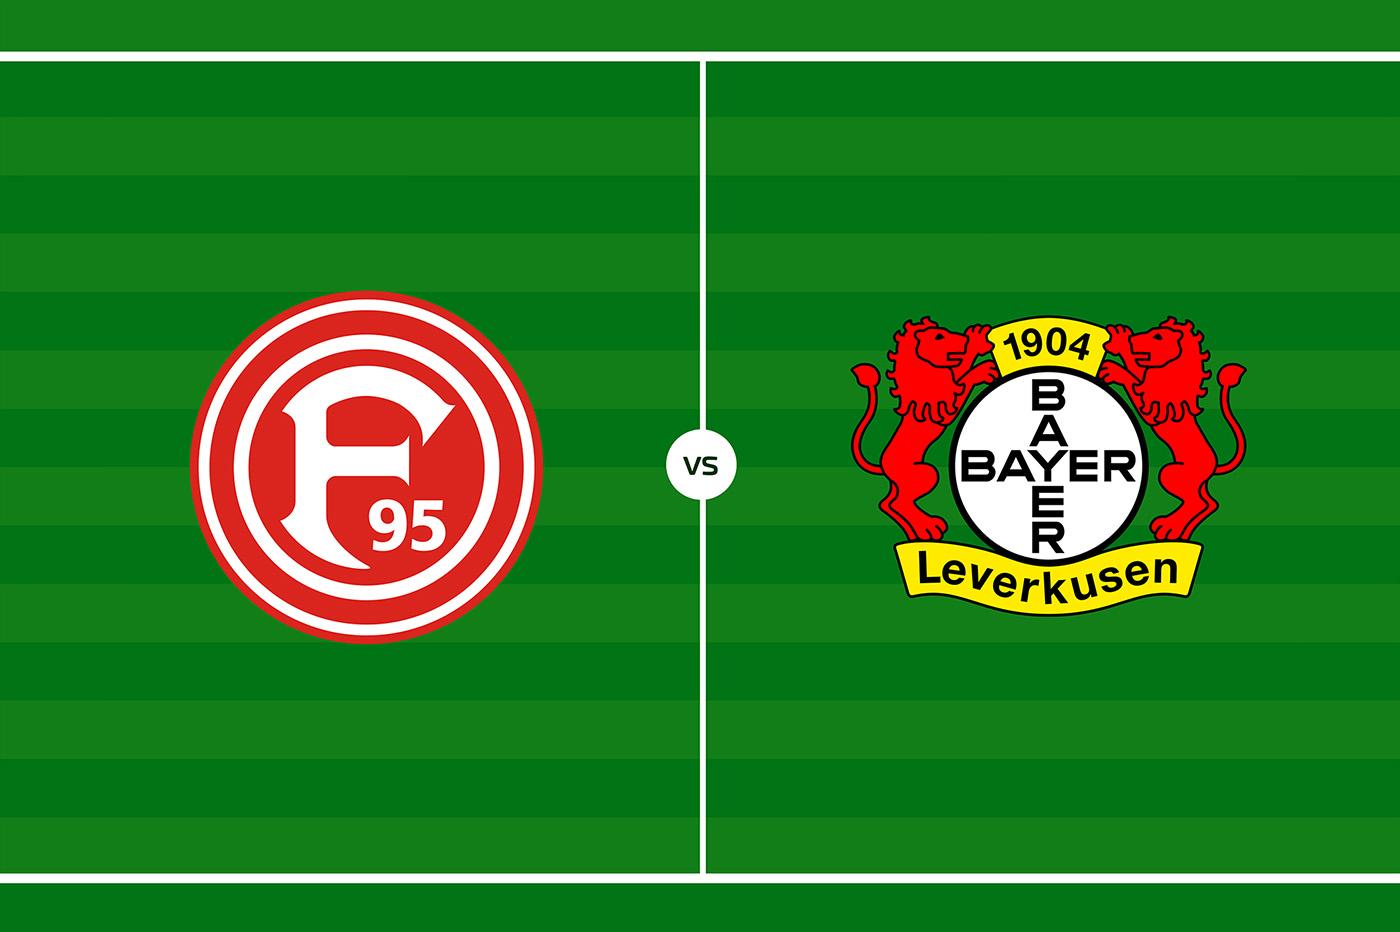 German Football League Fortuna Dusseldorf Vs Bayer